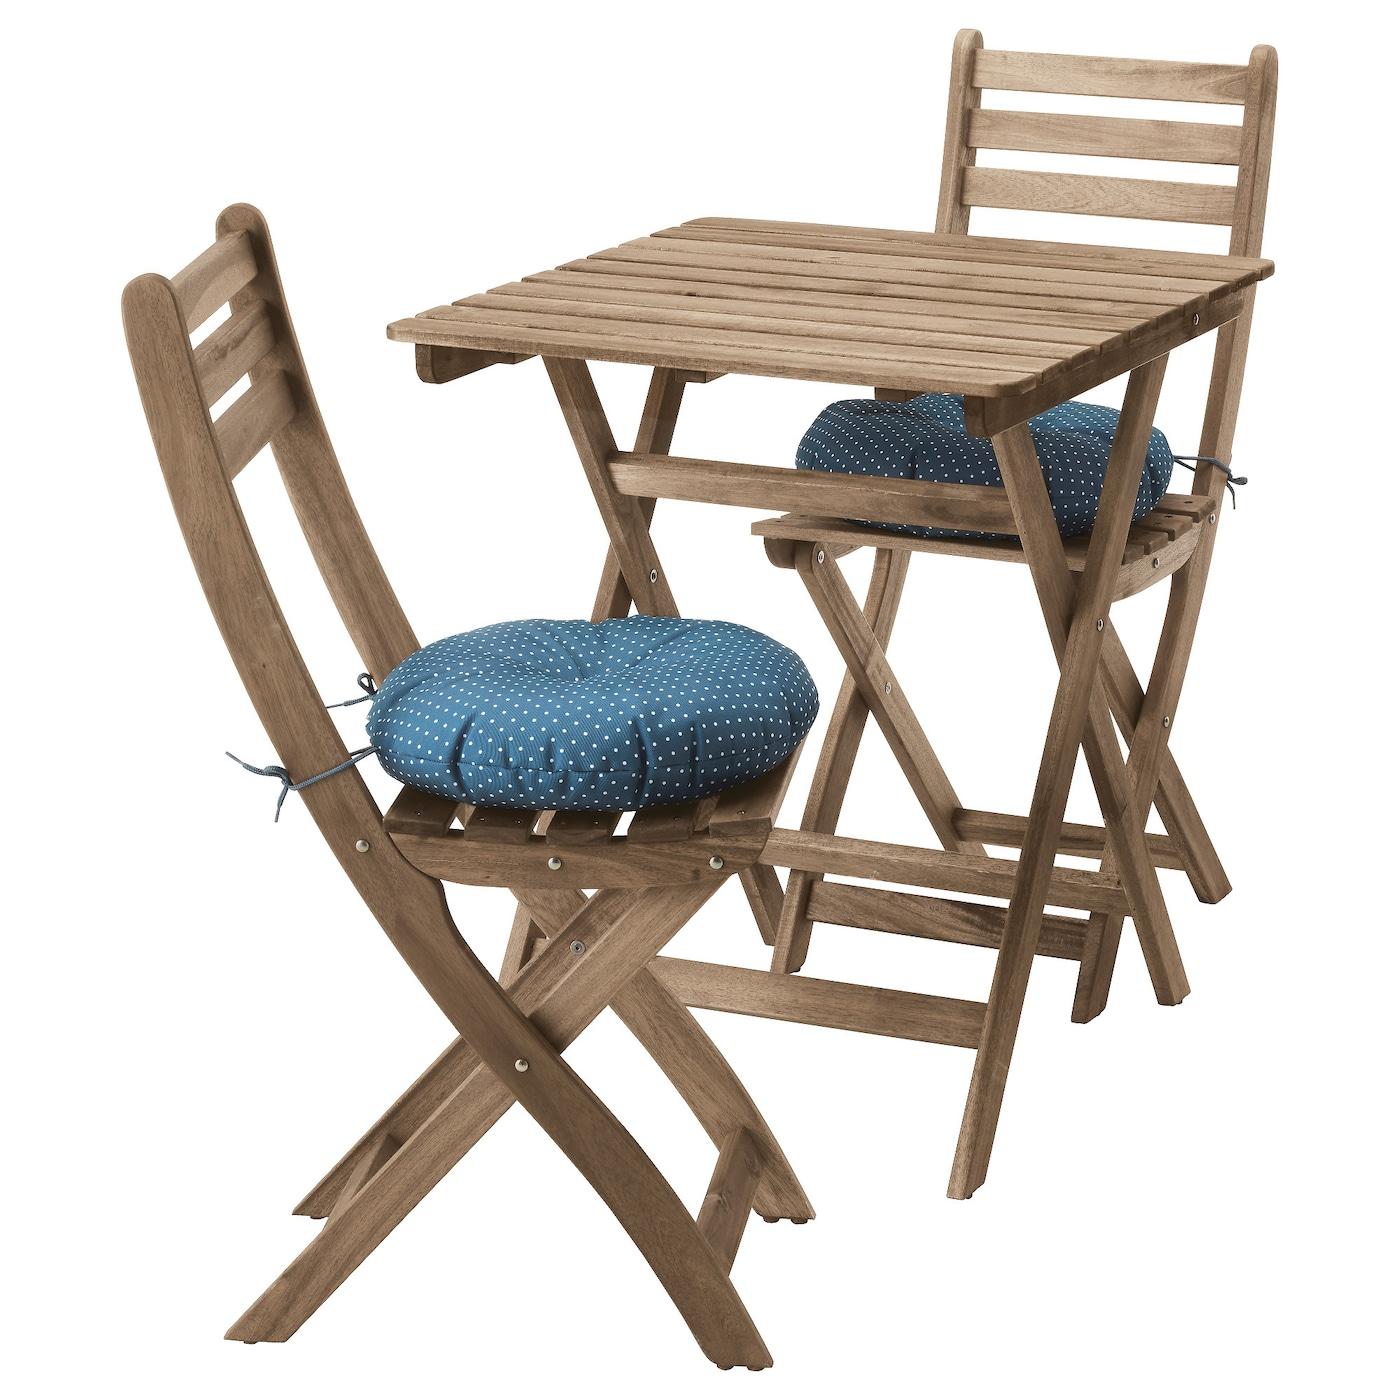 Tuintafels tuintafeltjes terrastafels design for Buiten stoelen